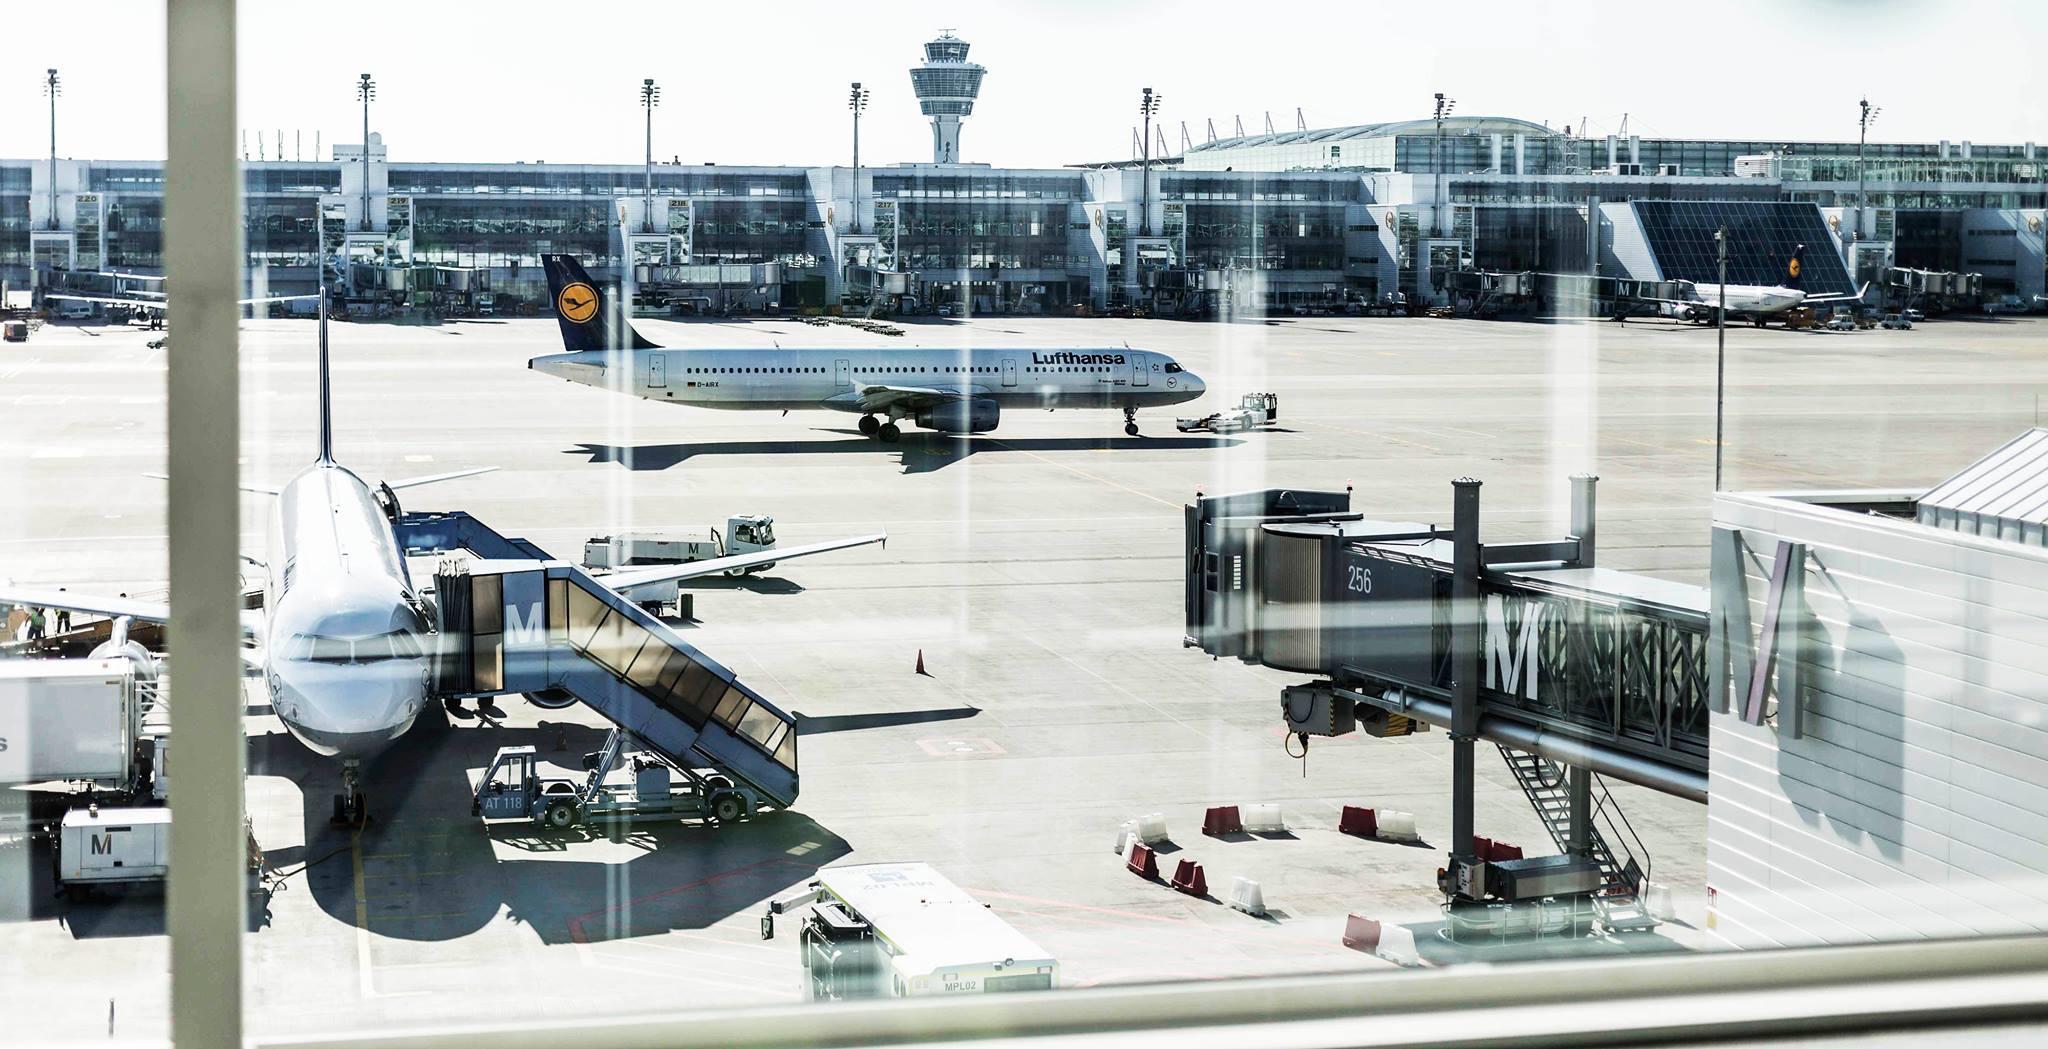 Lufthansa – voyage en avion pas cher – Dealabs